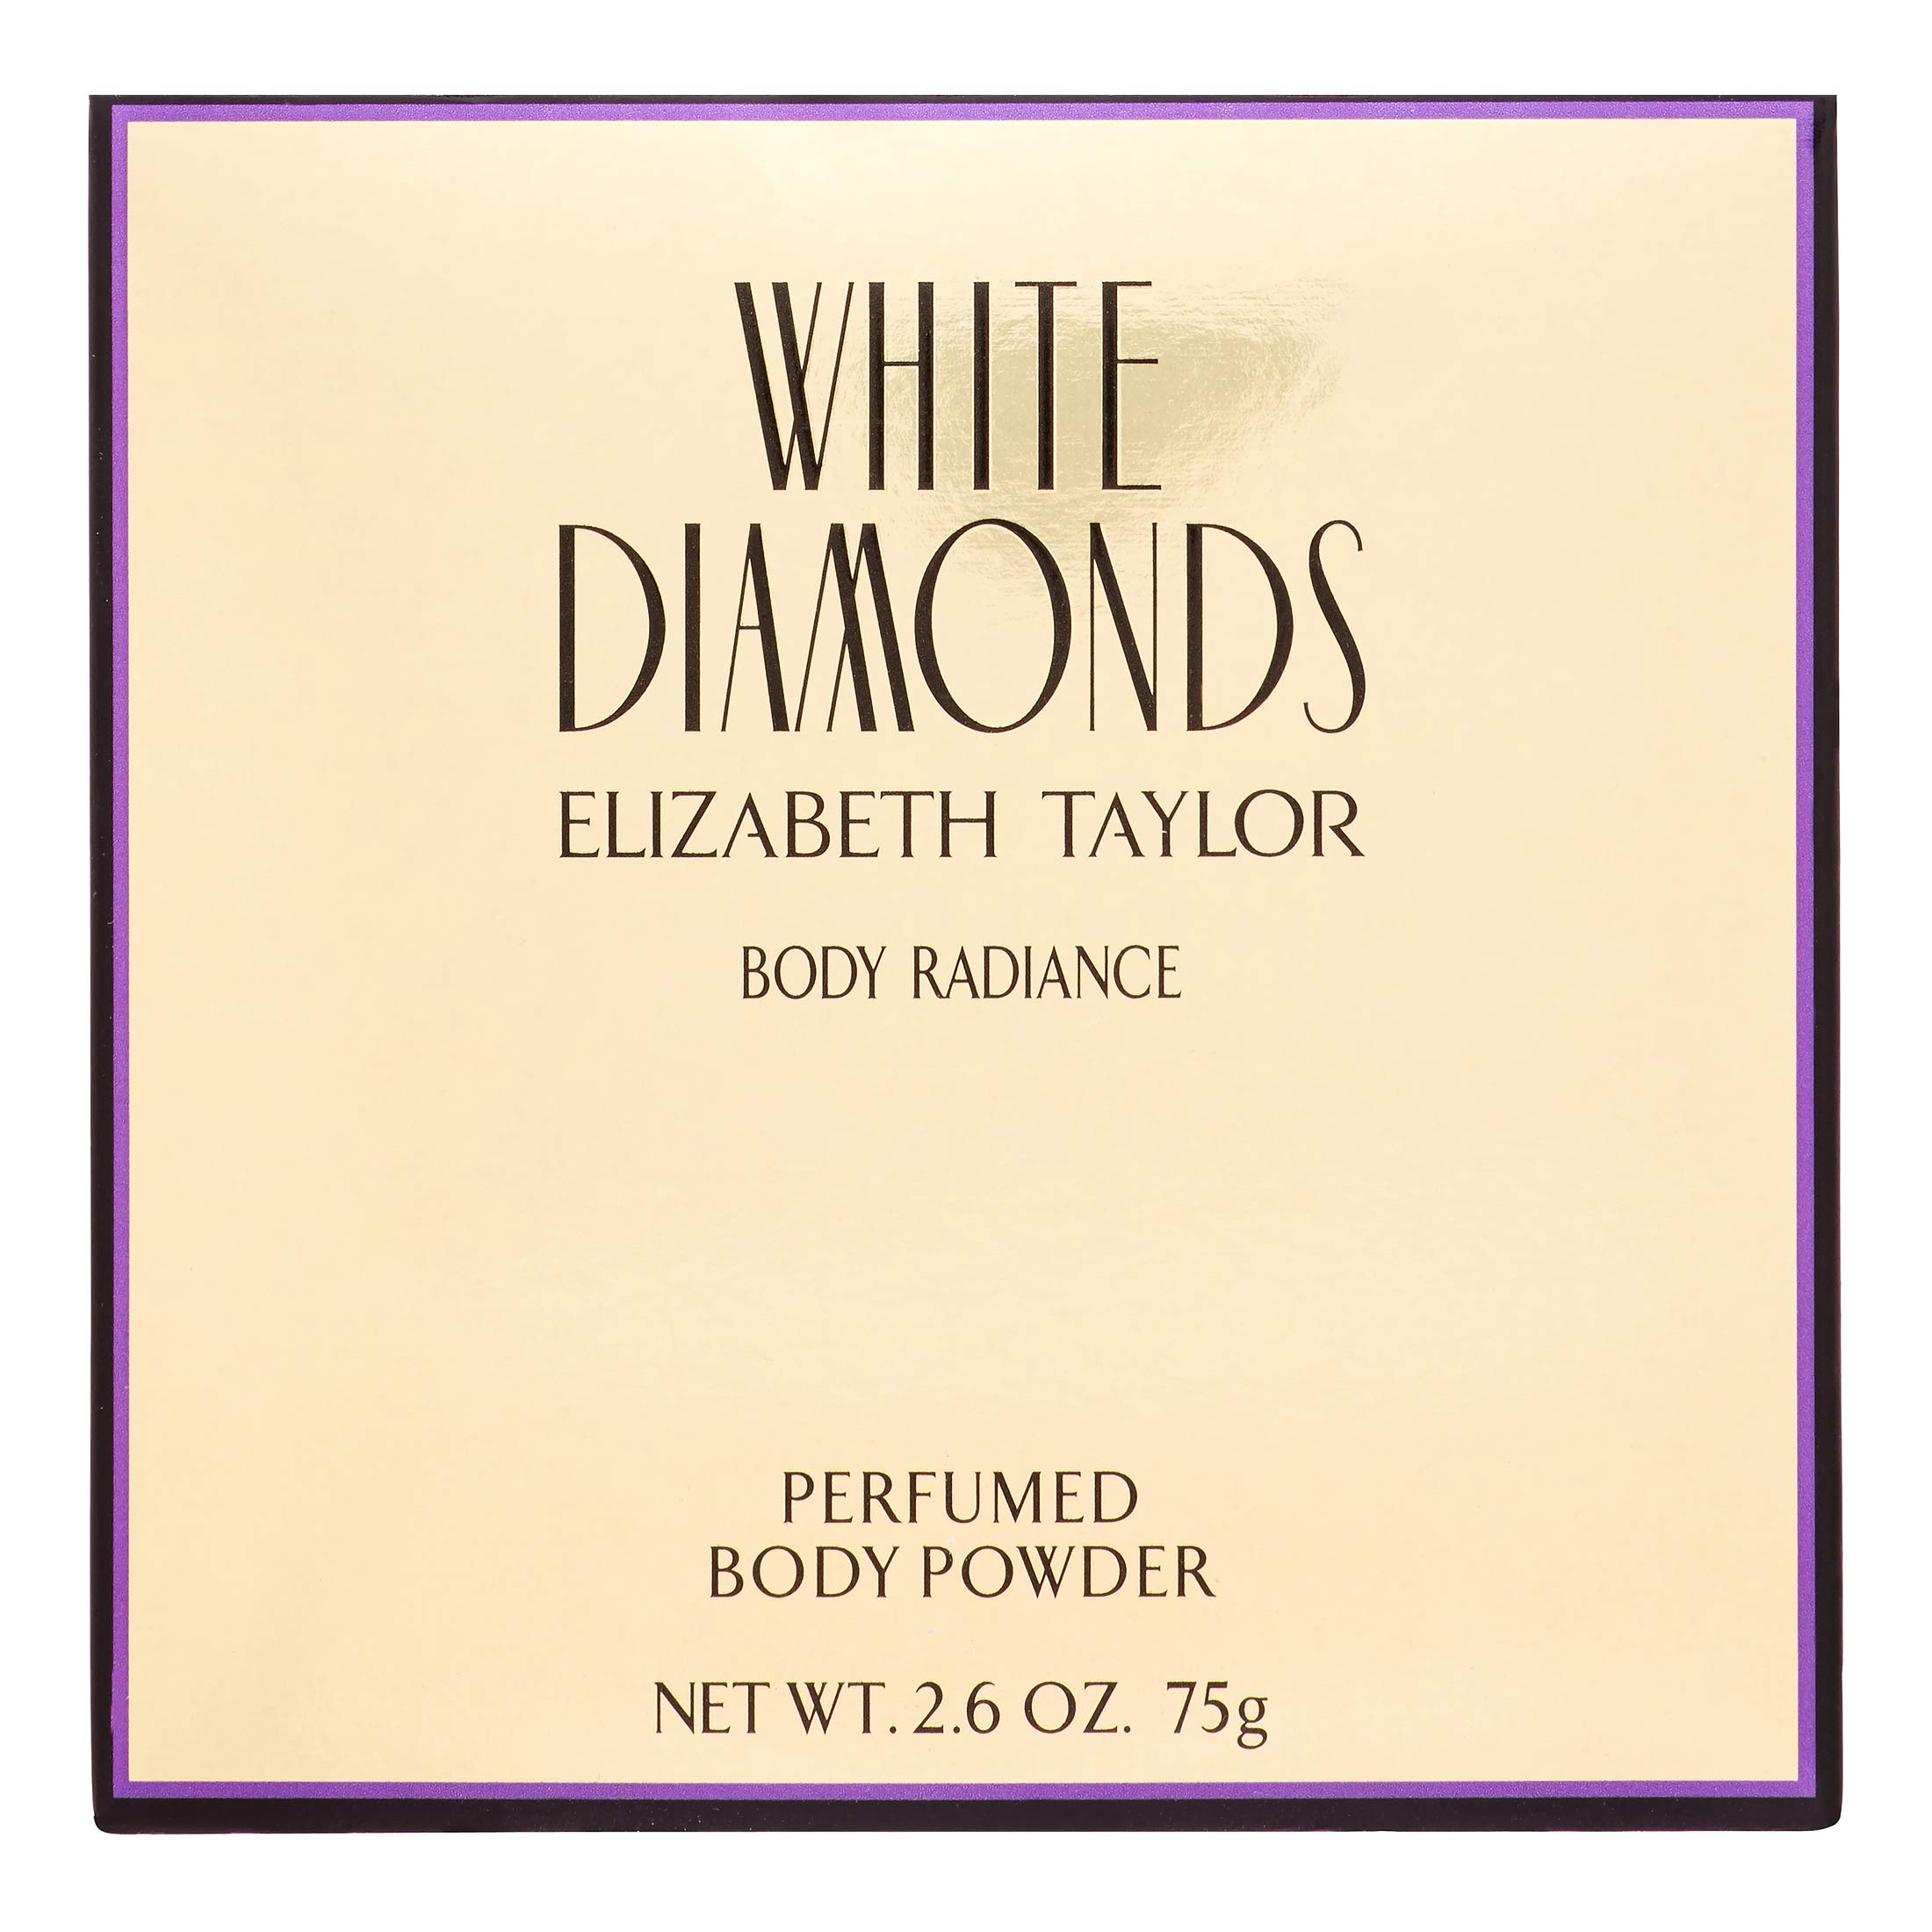 Elizabeth Taylor White Diamonds Body Radiance Perfumed Body Powder 2.60 oz (Pack of 4)